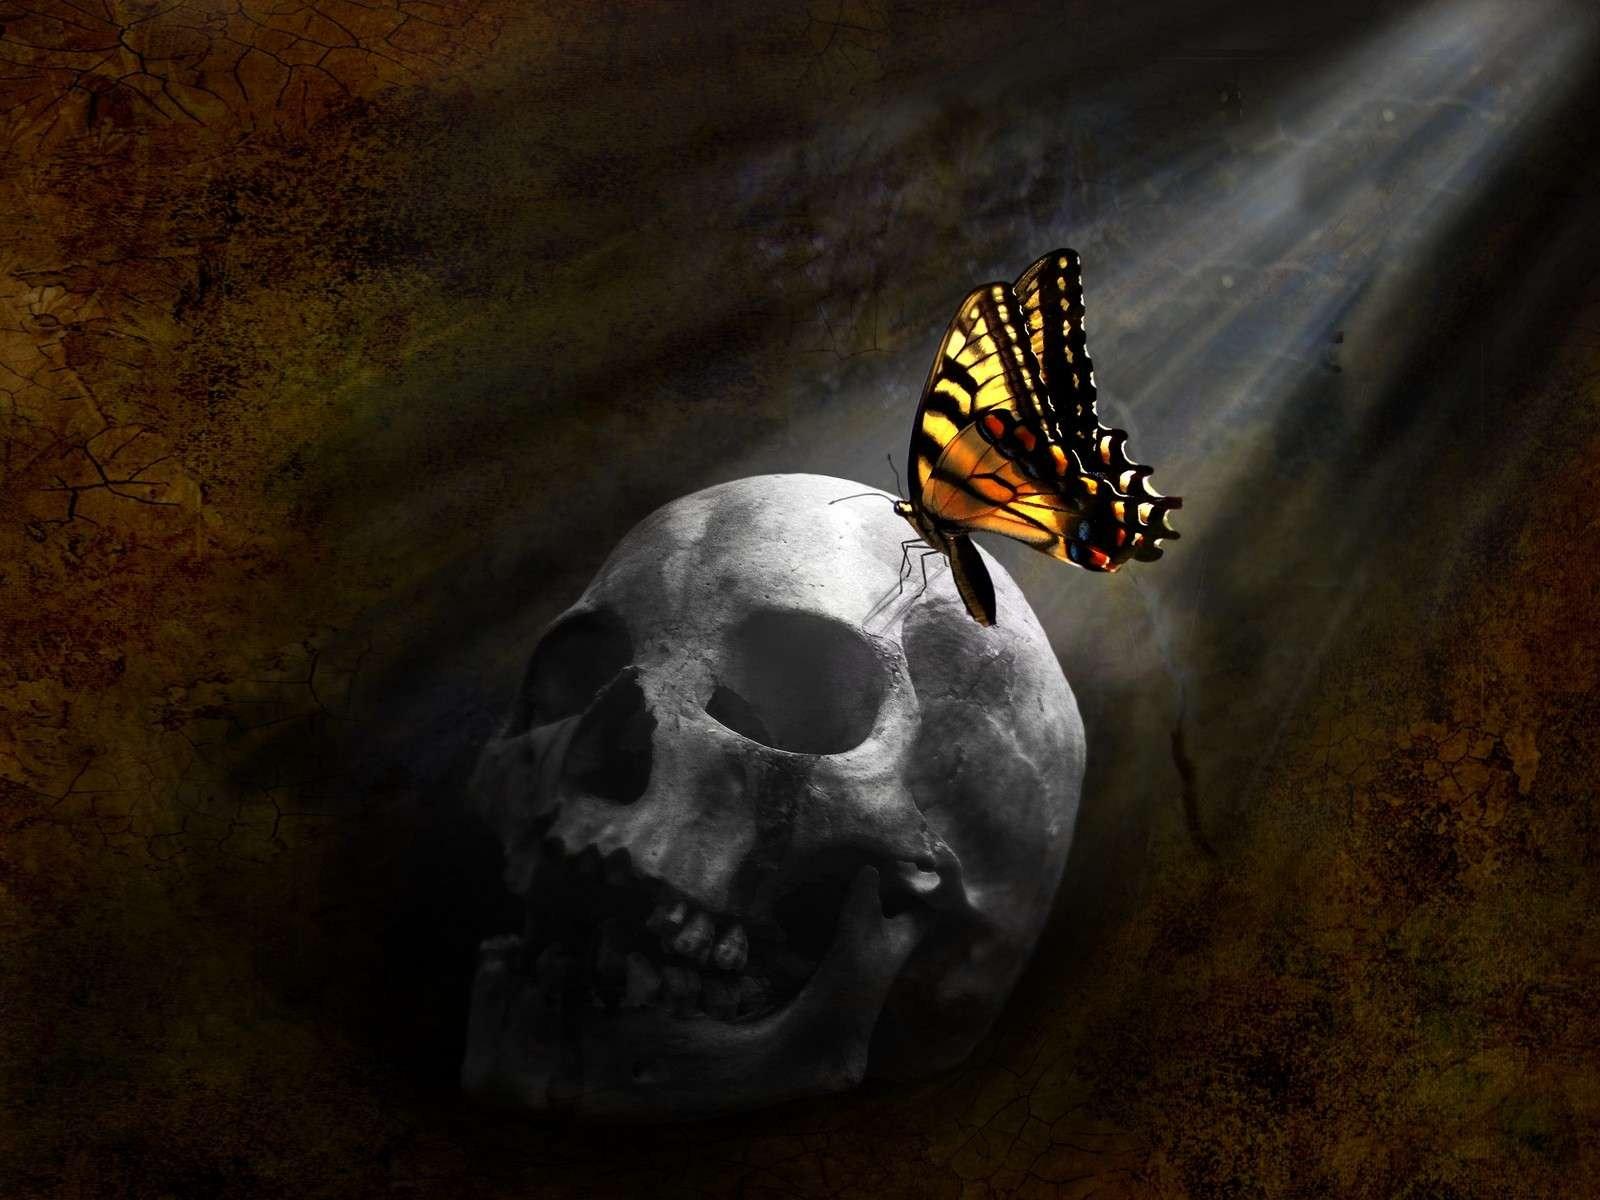 MK (Mind Kontrolle) Ultra Program: PsyOps & Satanic Infiltration